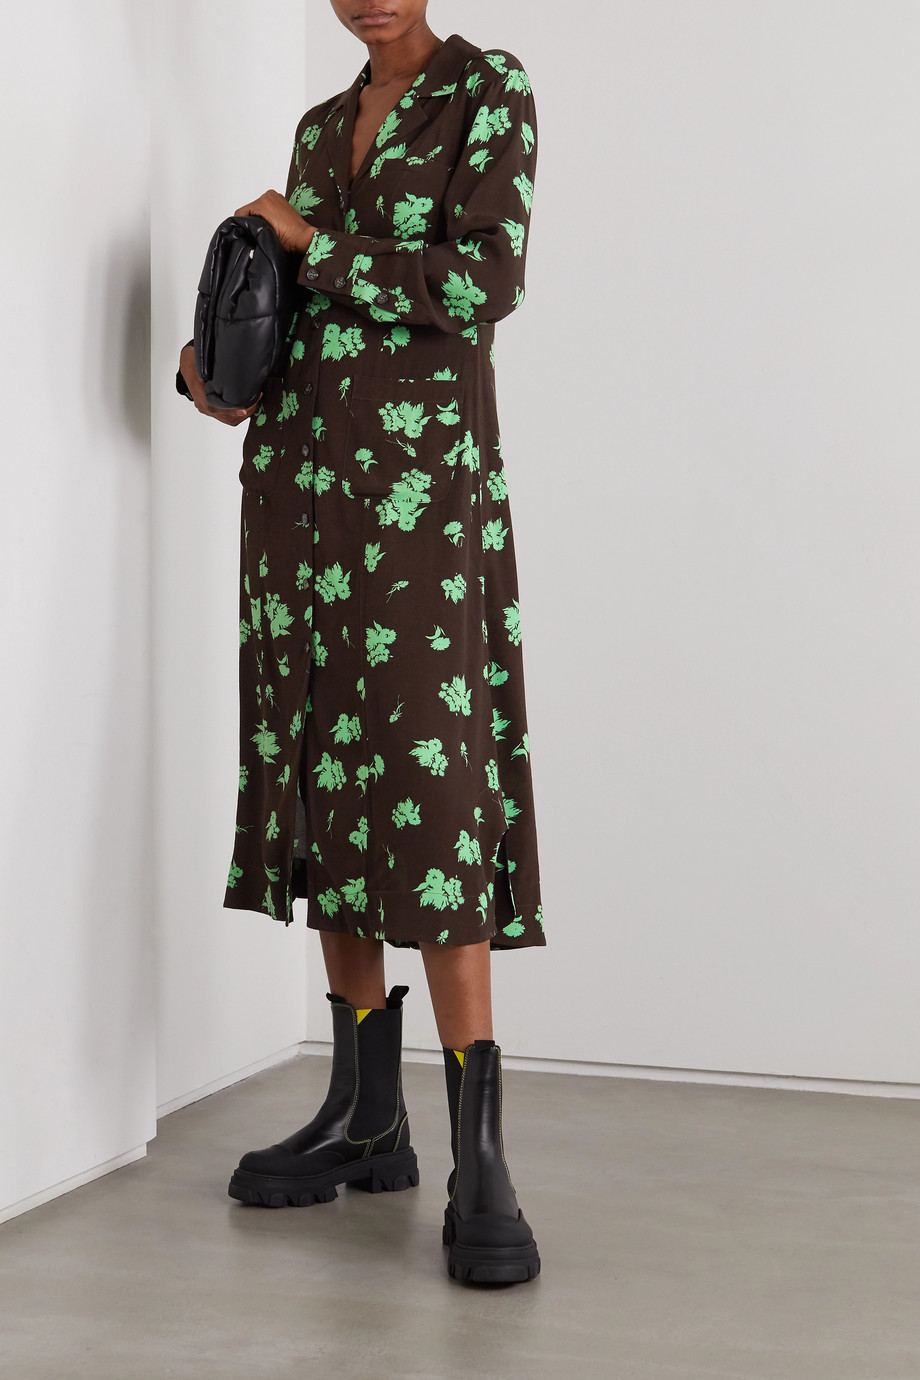 GANNI + NET SUSTAIN Midi-Hemdblusenkleid aus Crêpe mit Blumenprint